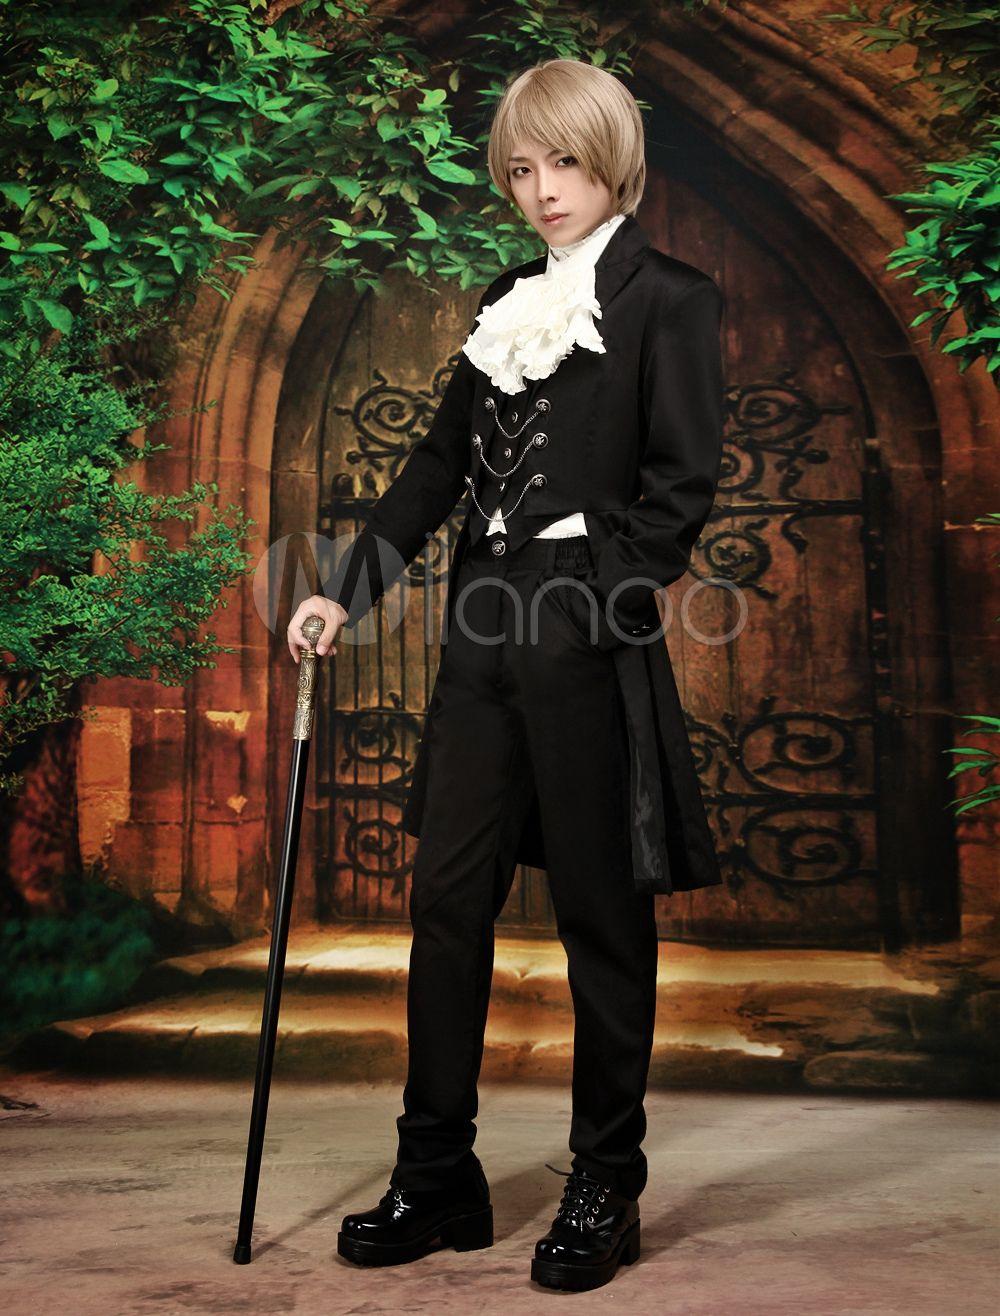 Aristocrat Long Sleeves Cotton Blend Black Lolita Outfits